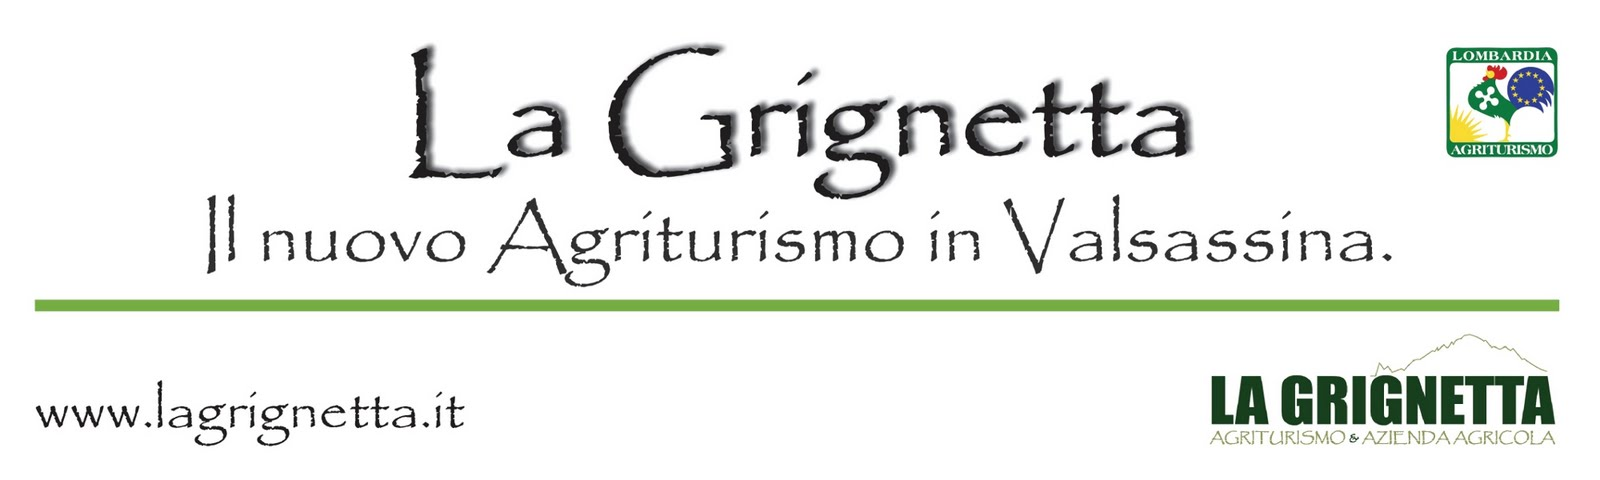 La Grignetta Agriturismo & Azienda agricola